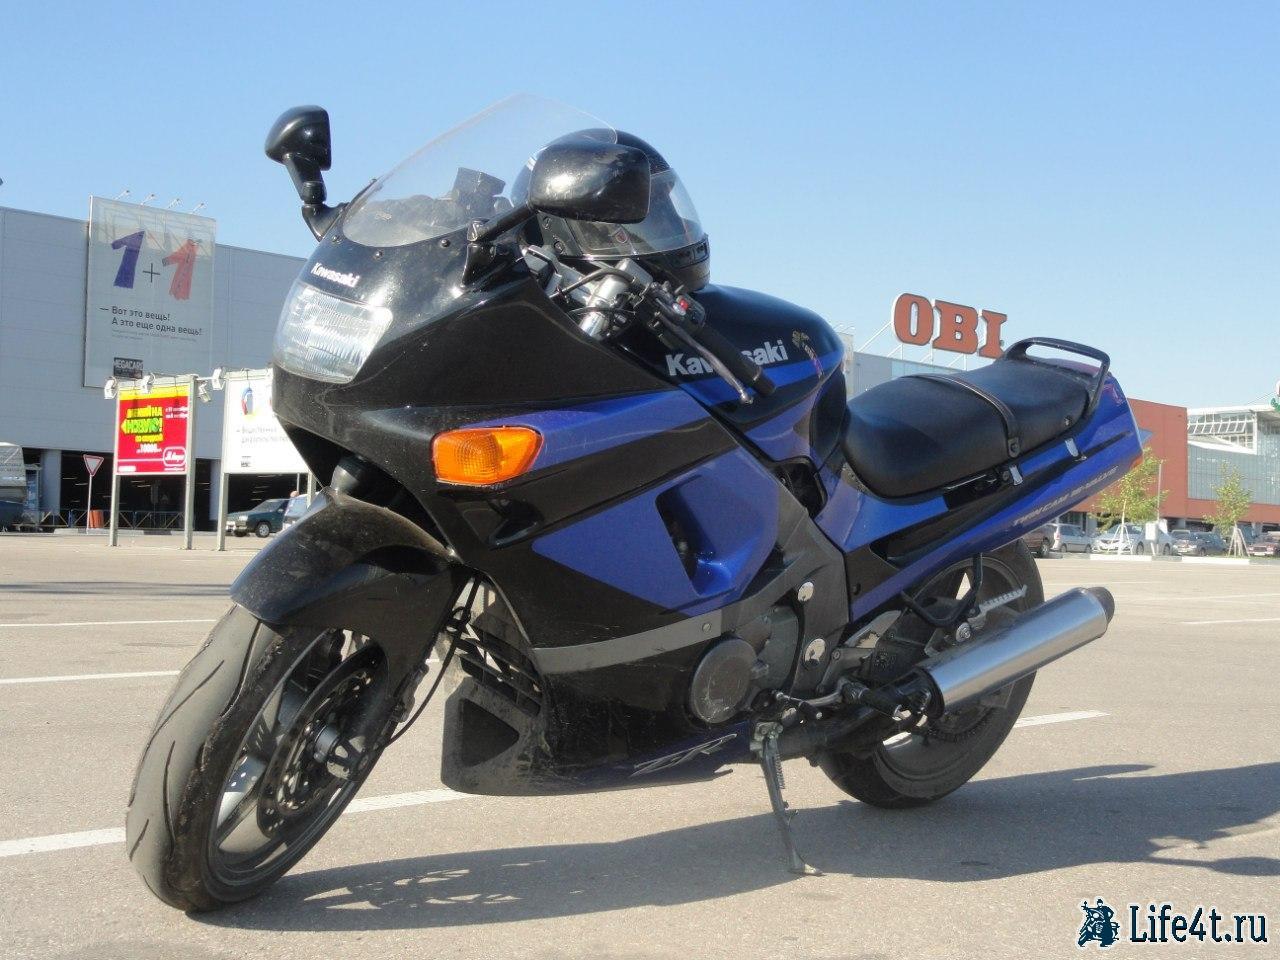 Покупка мотоцикла. Начало 2012